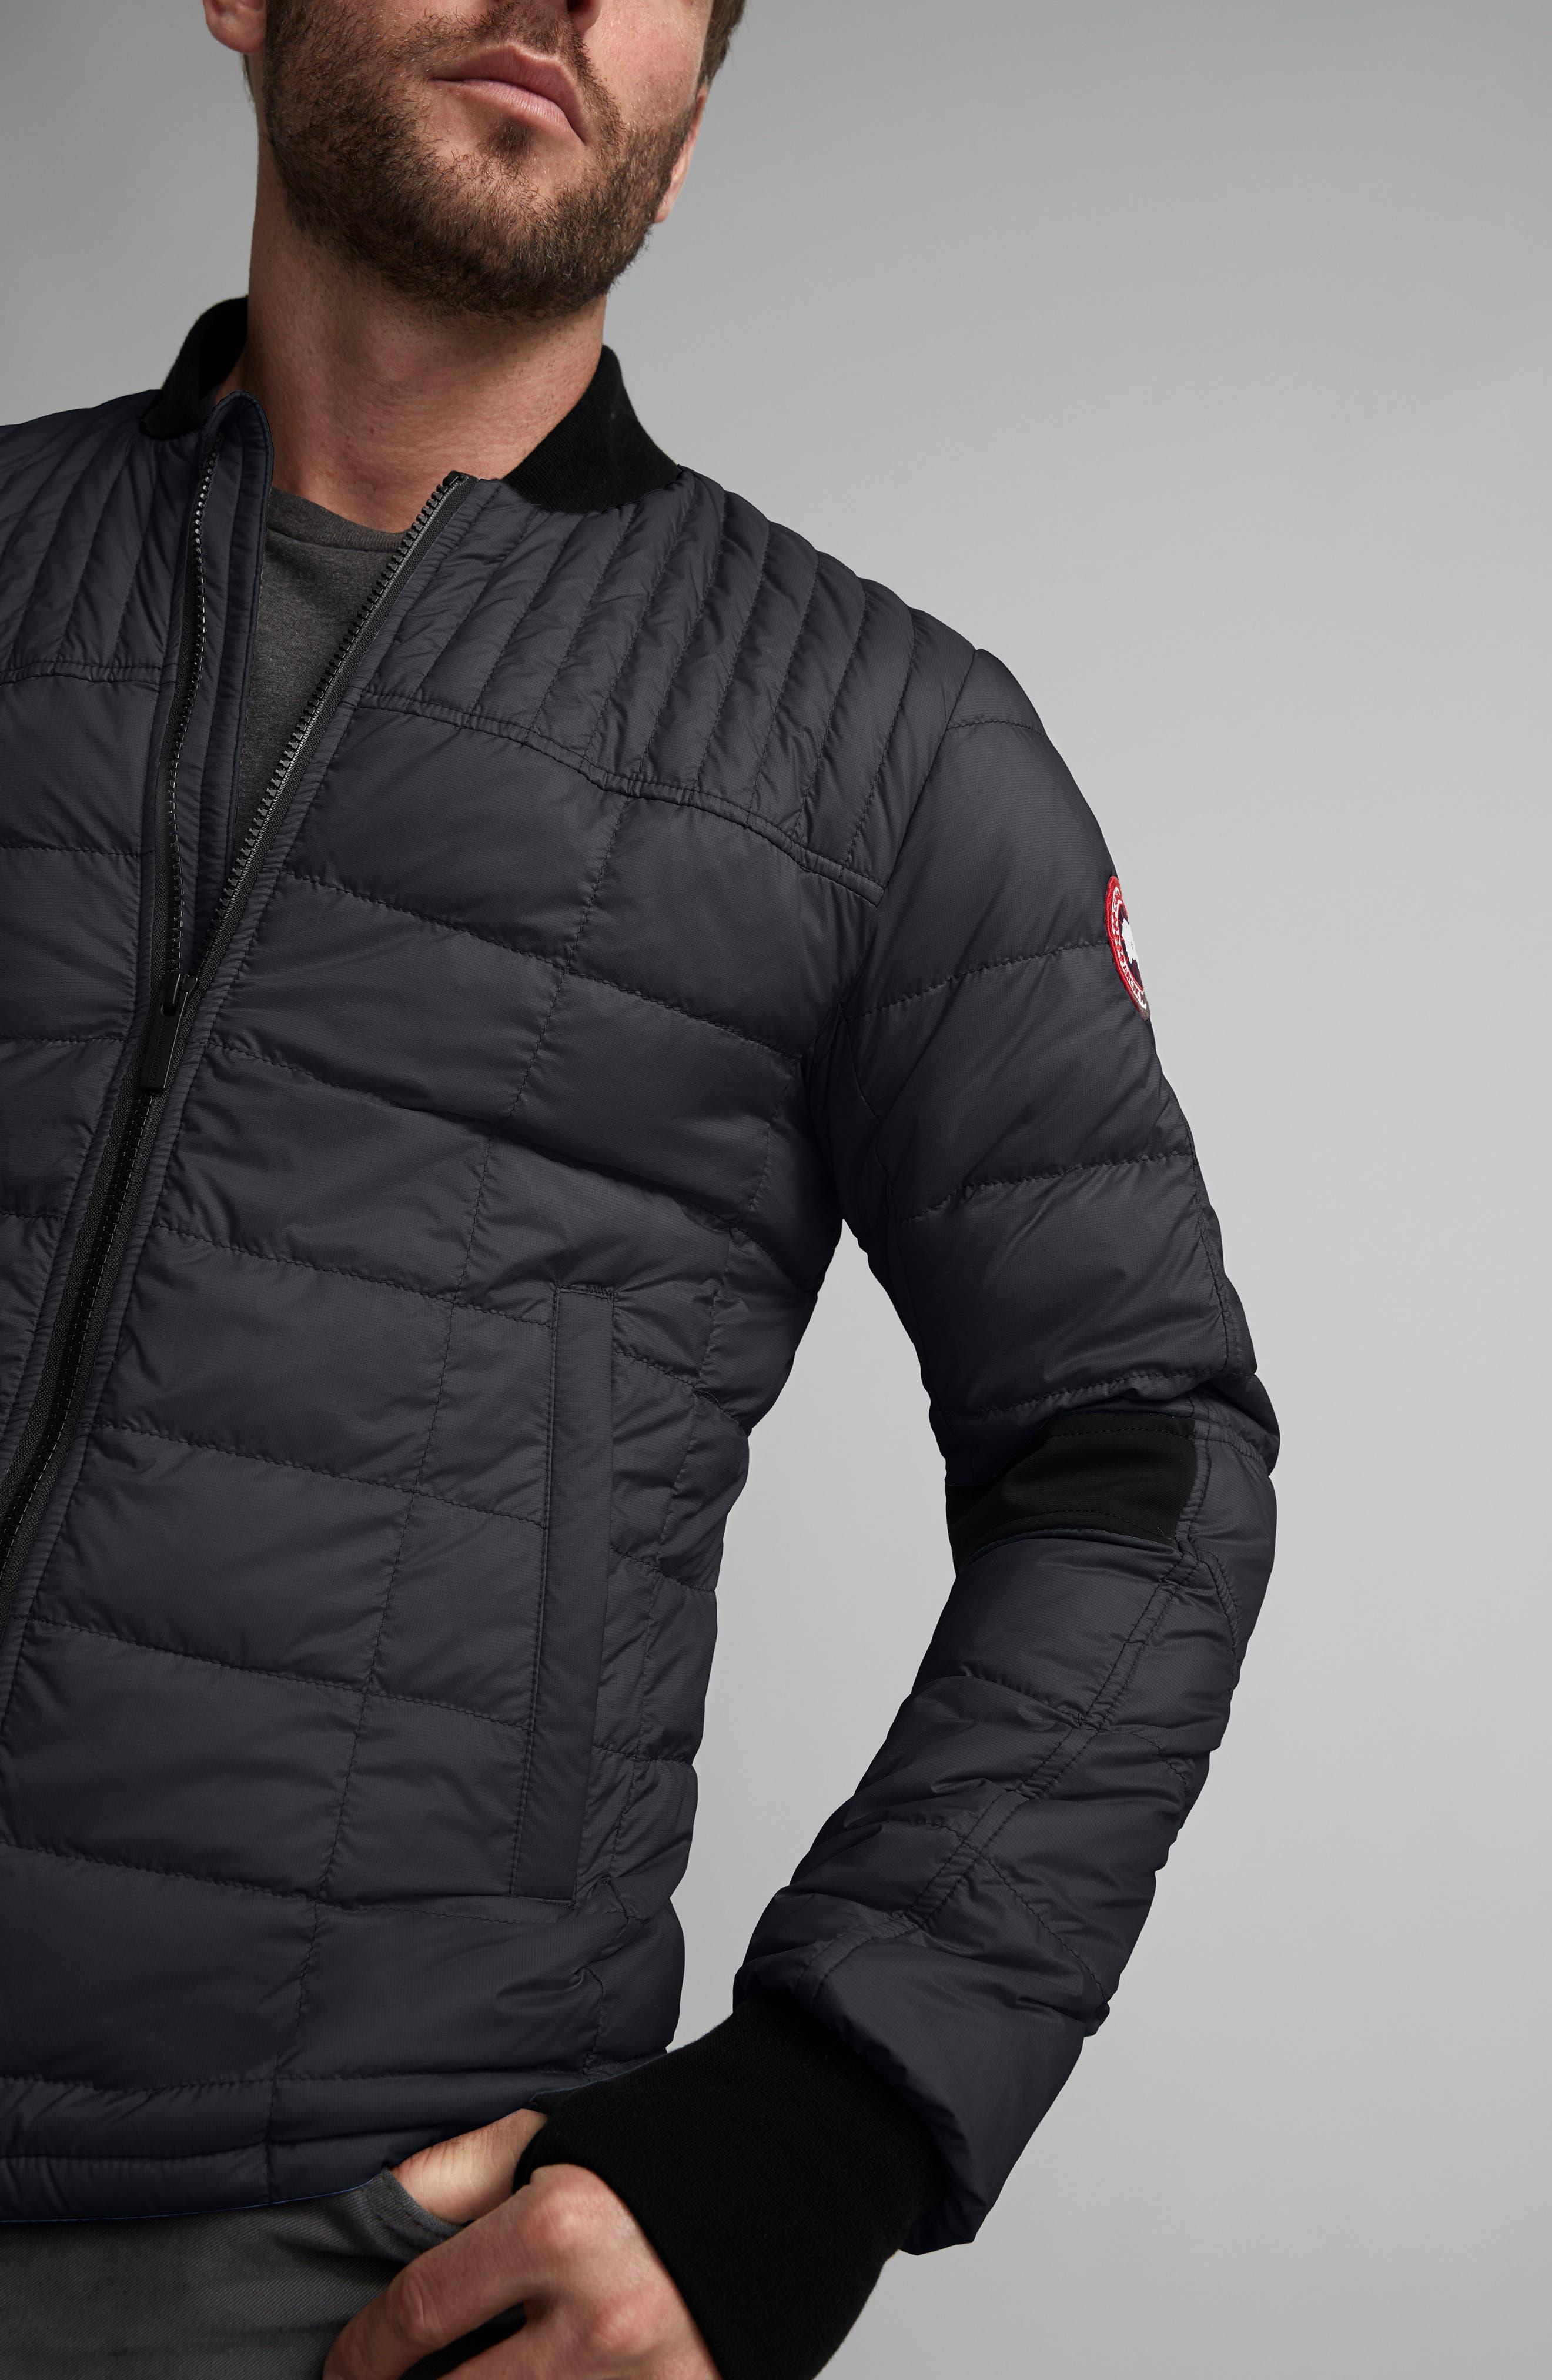 CANADA GOOSE, Dunham Slim Fit Packable Down Jacket, Alternate thumbnail 2, color, 001